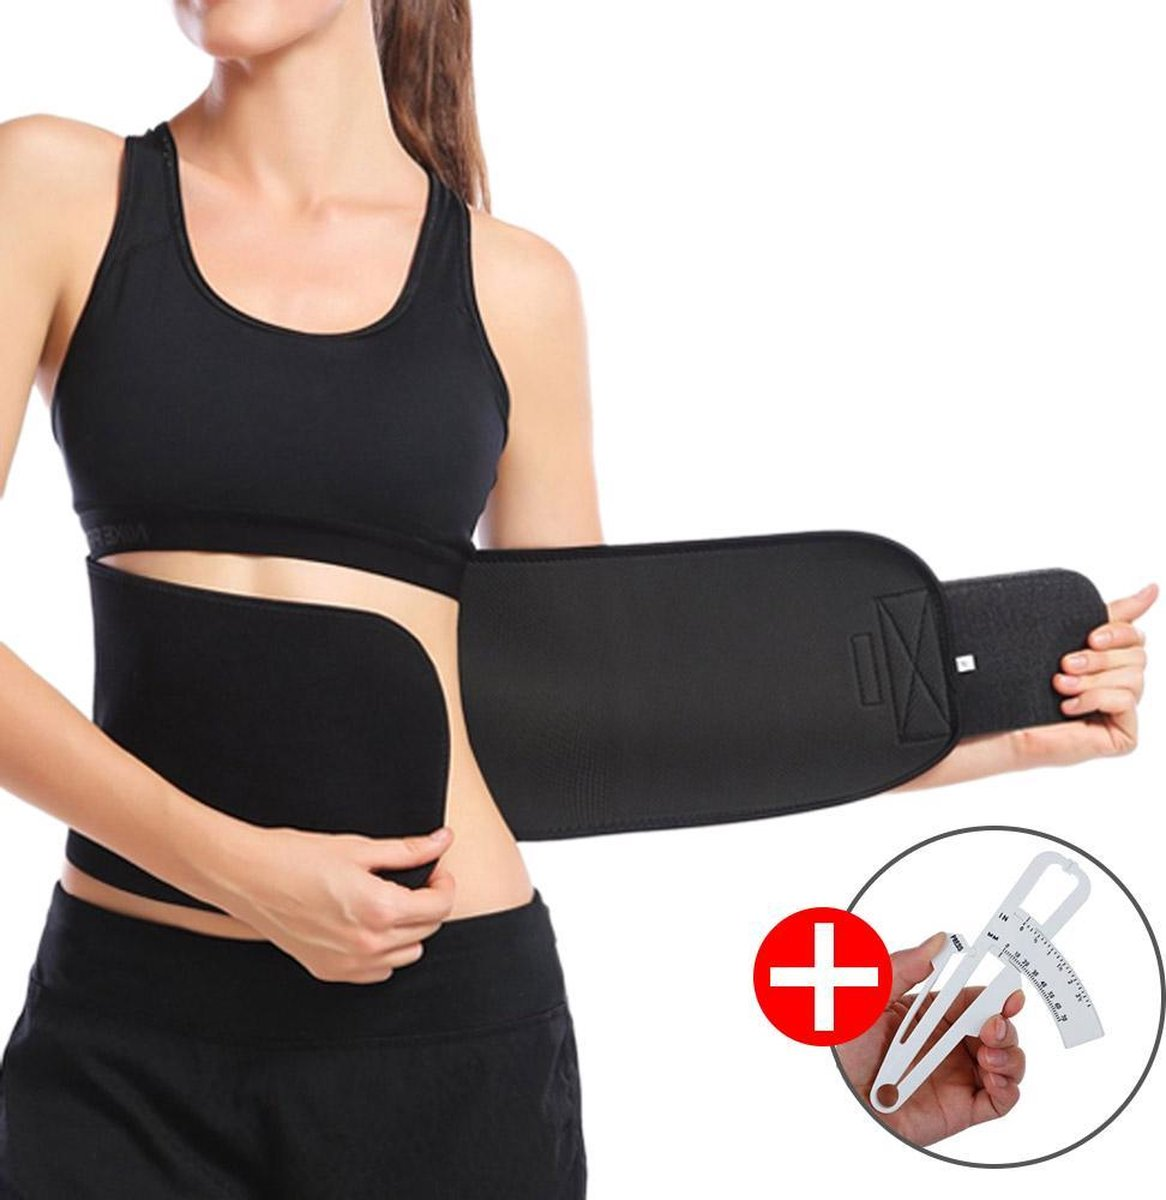 Goodlux sauna belt – Zweetband buik – Afslankband – Waist trainer